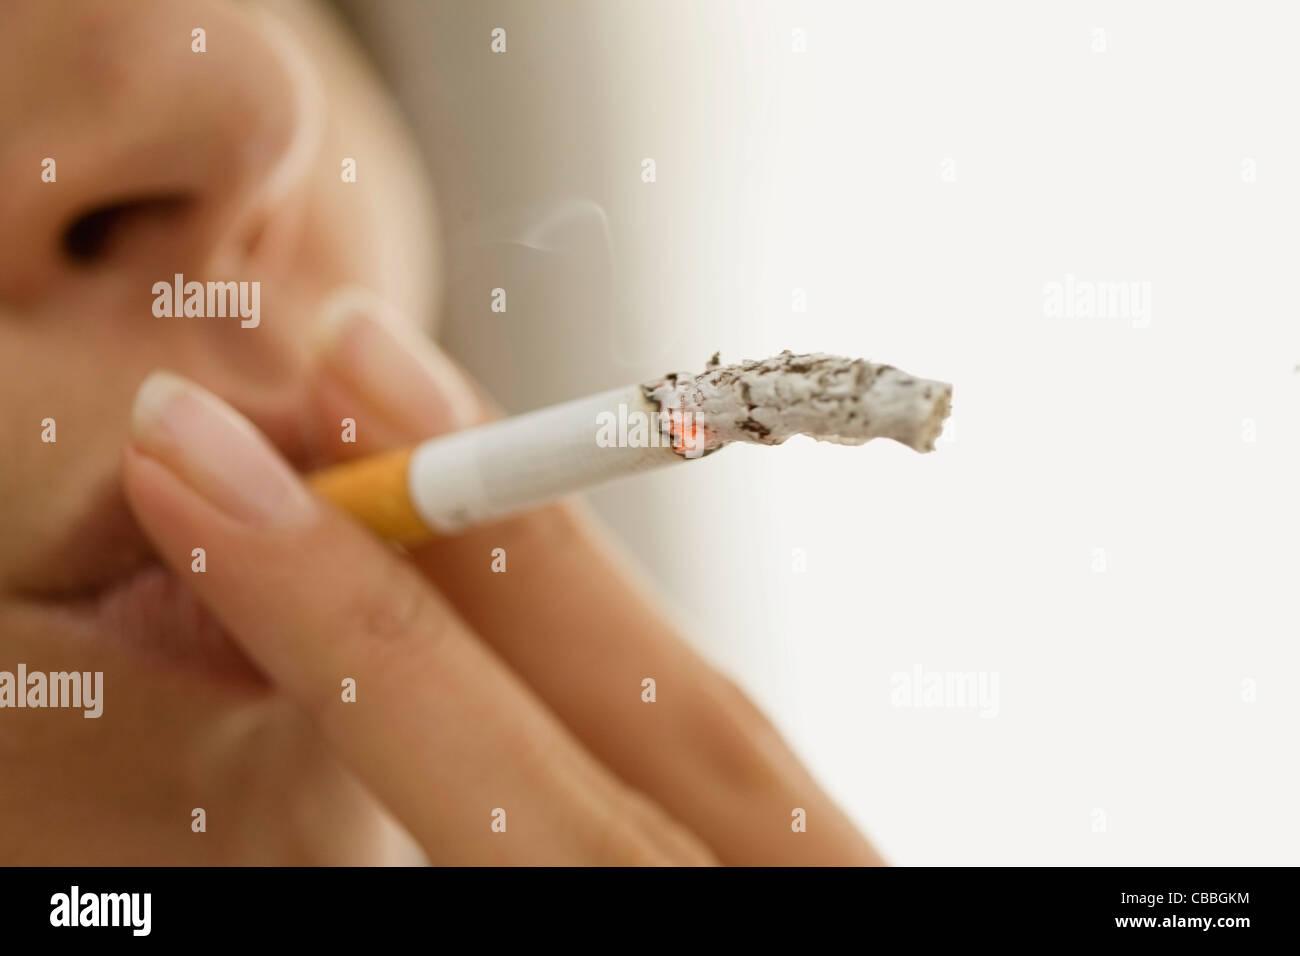 Close up of woman smoking cigarette - Stock Image